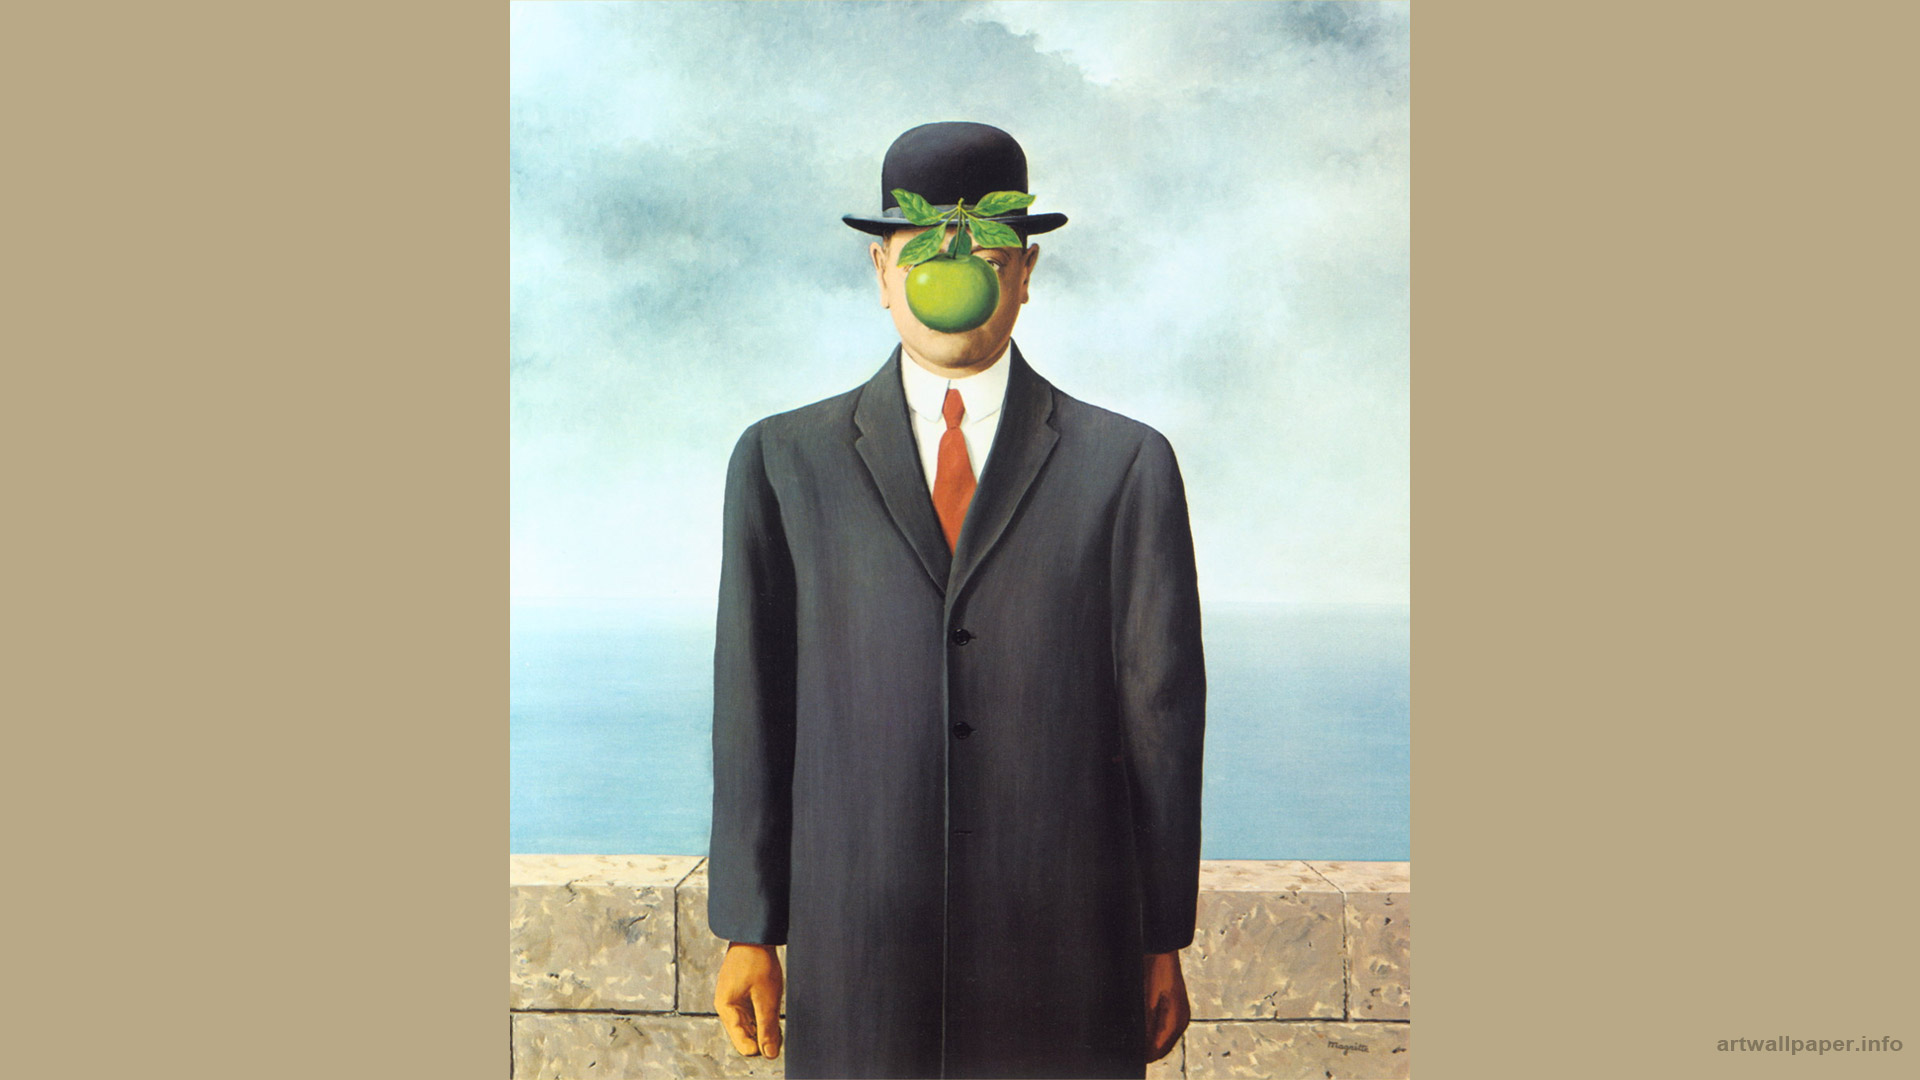 Rene Magritte Wallpaper 1920x1080